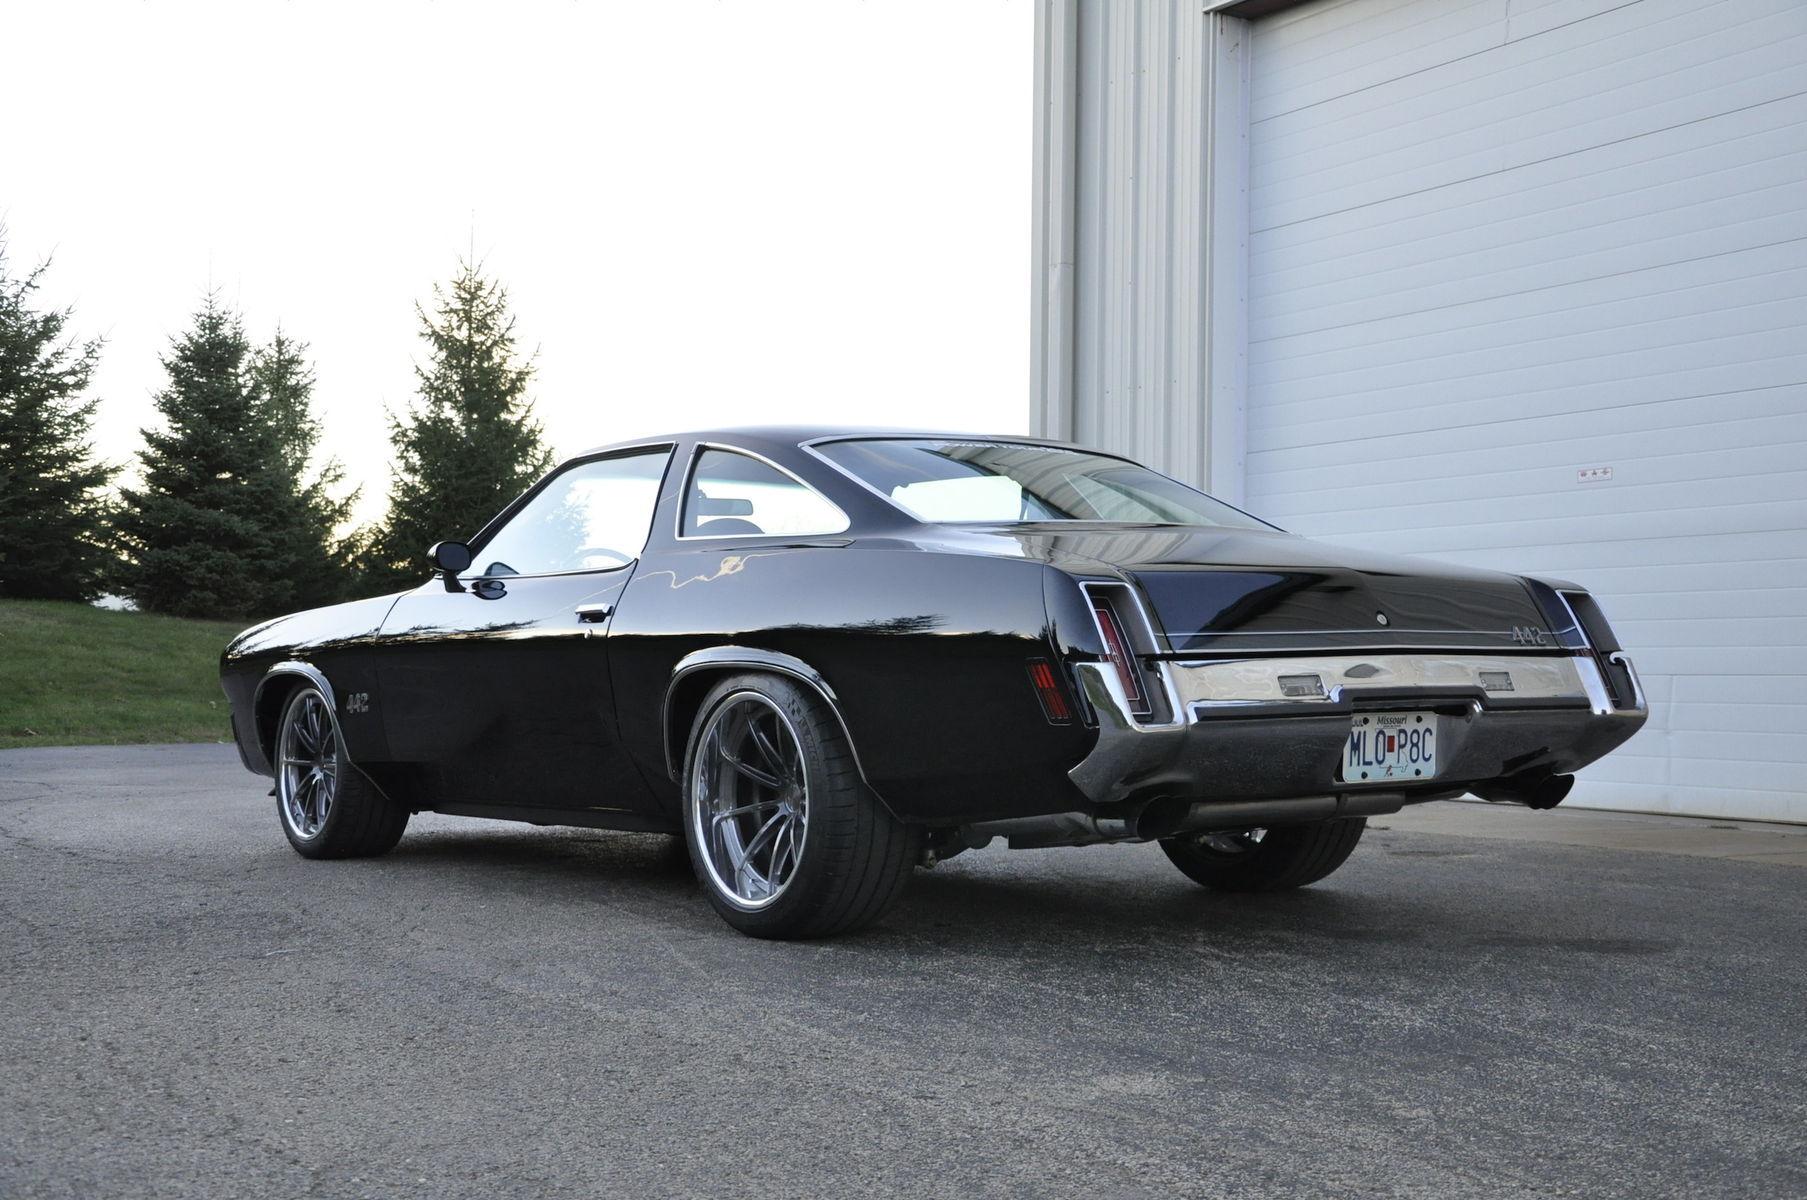 1973 Oldsmobile Cutlass | Schwartz Performance '73 Olds Cutlass on Forgeline GT3C Wheels